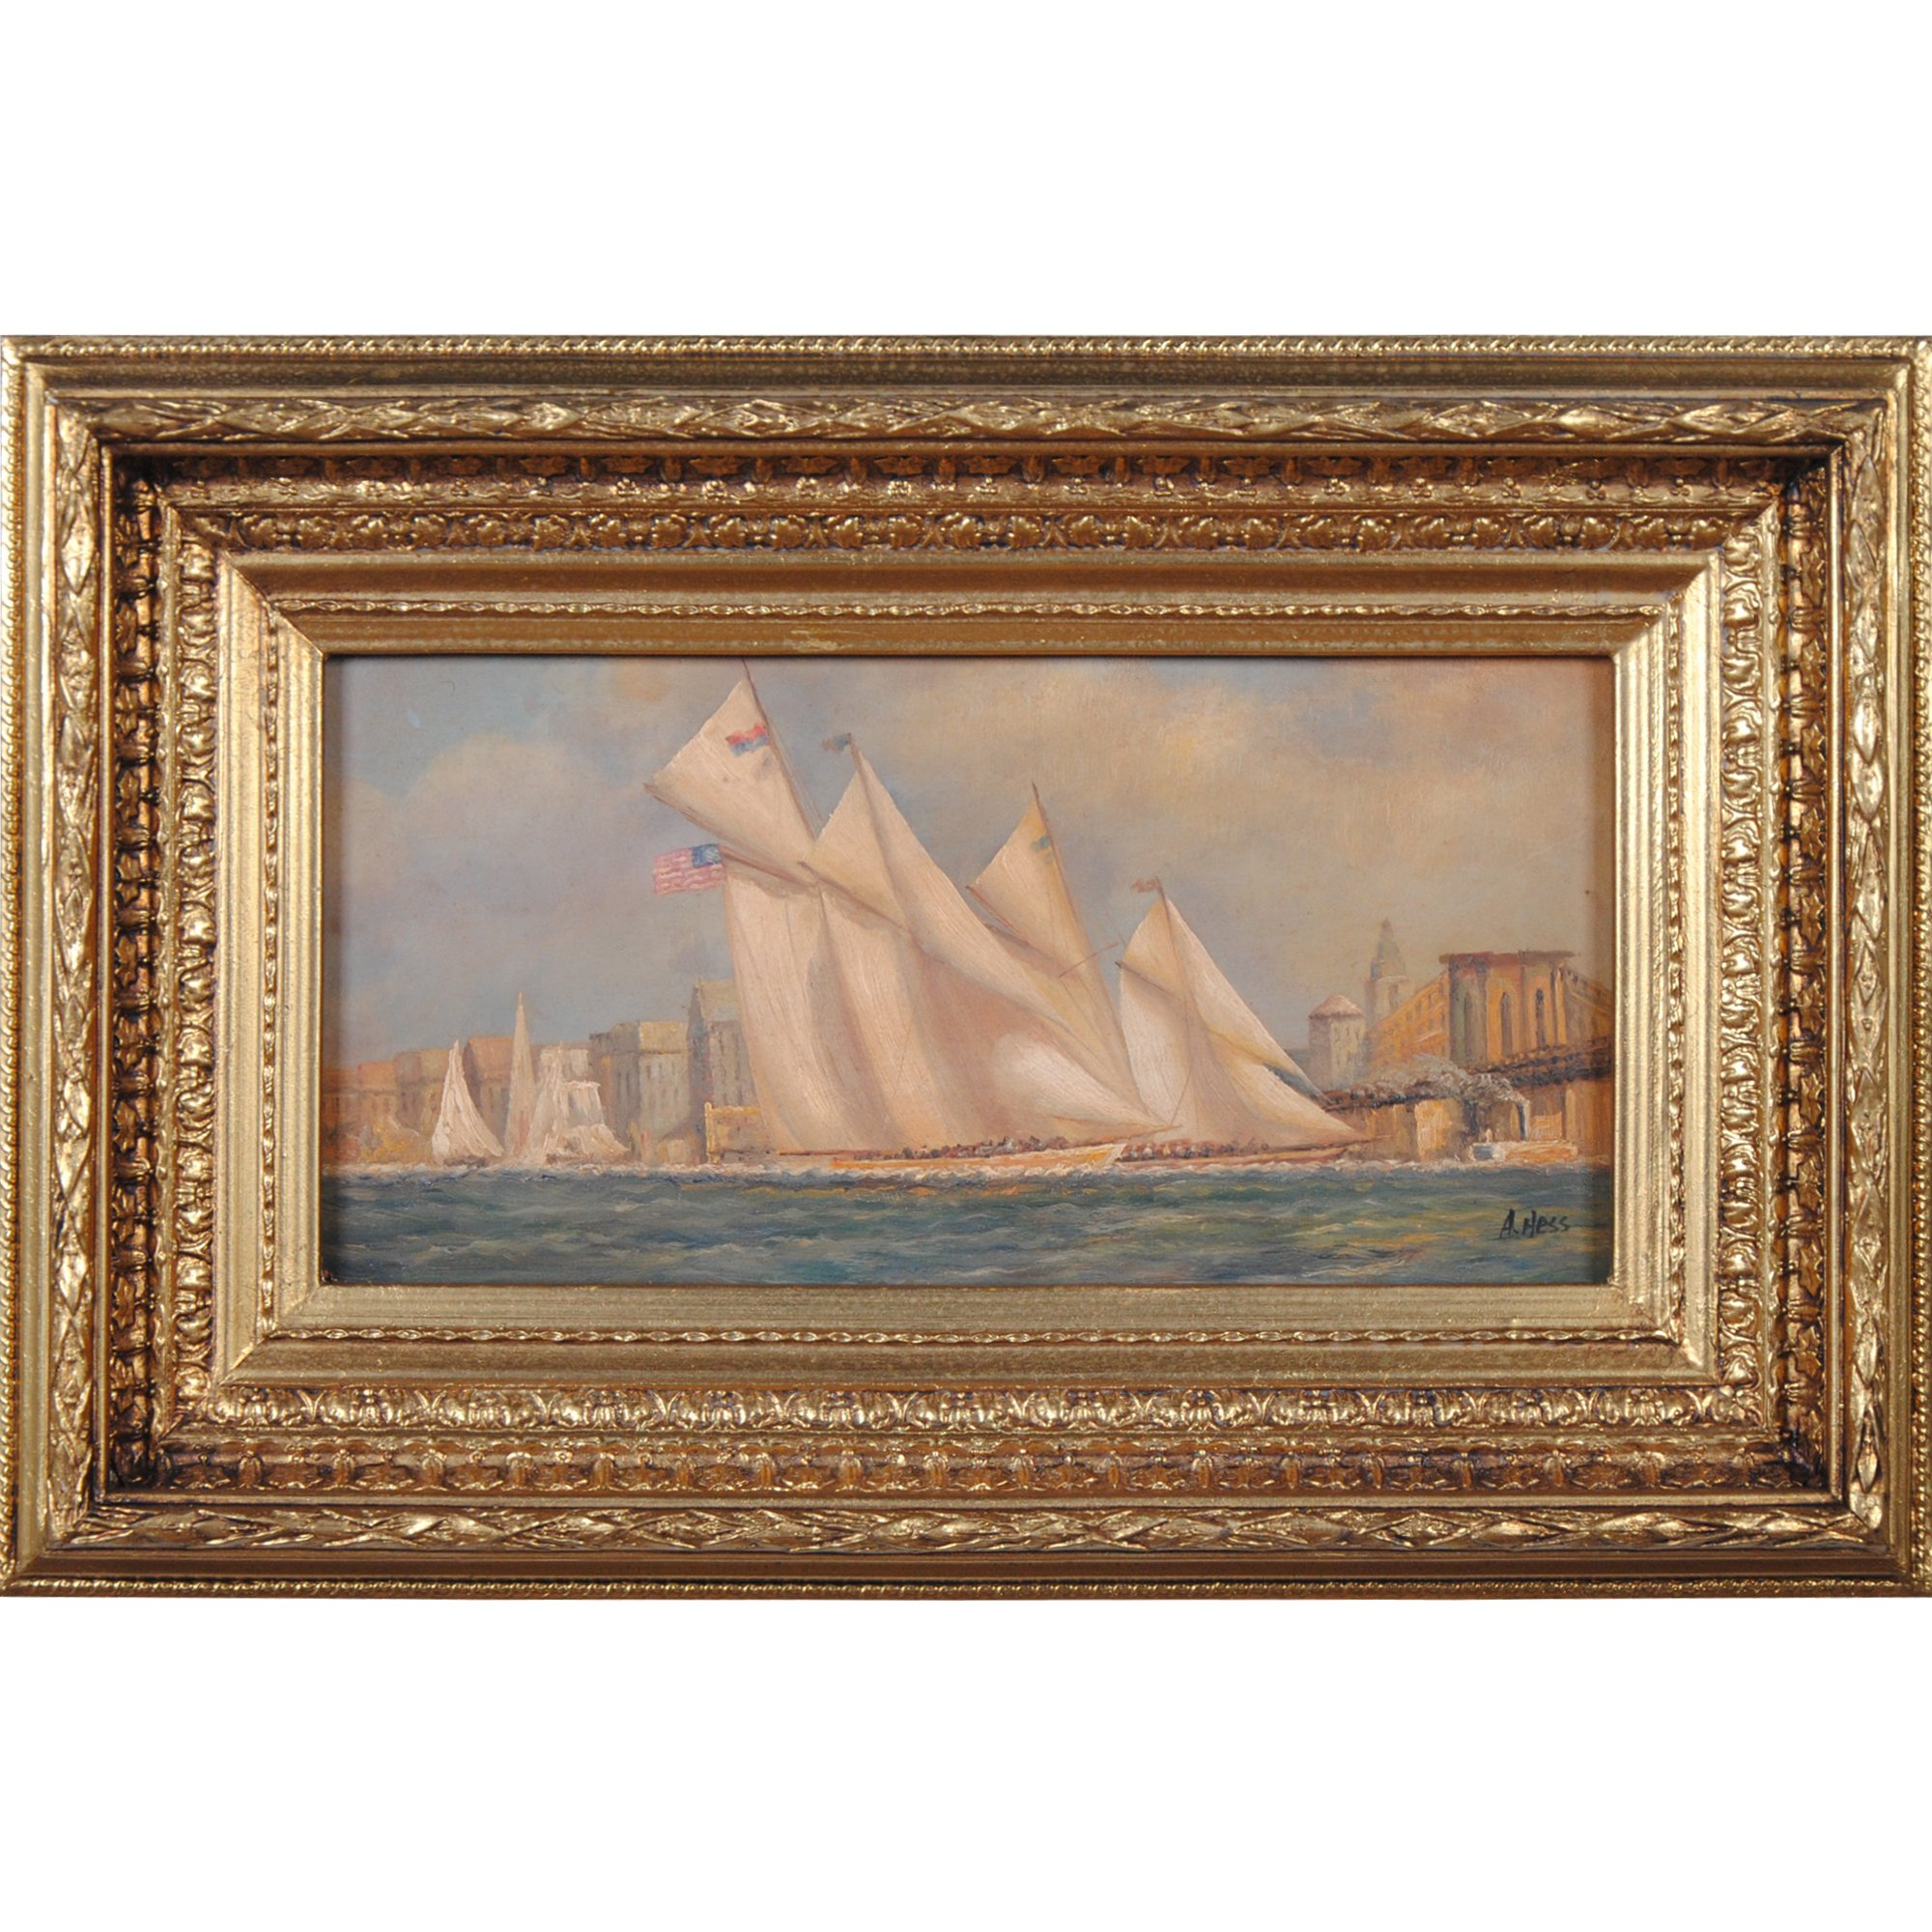 FTN030-SC006-2, Niagara Furniture, Ships Sailing by Bridge Scene